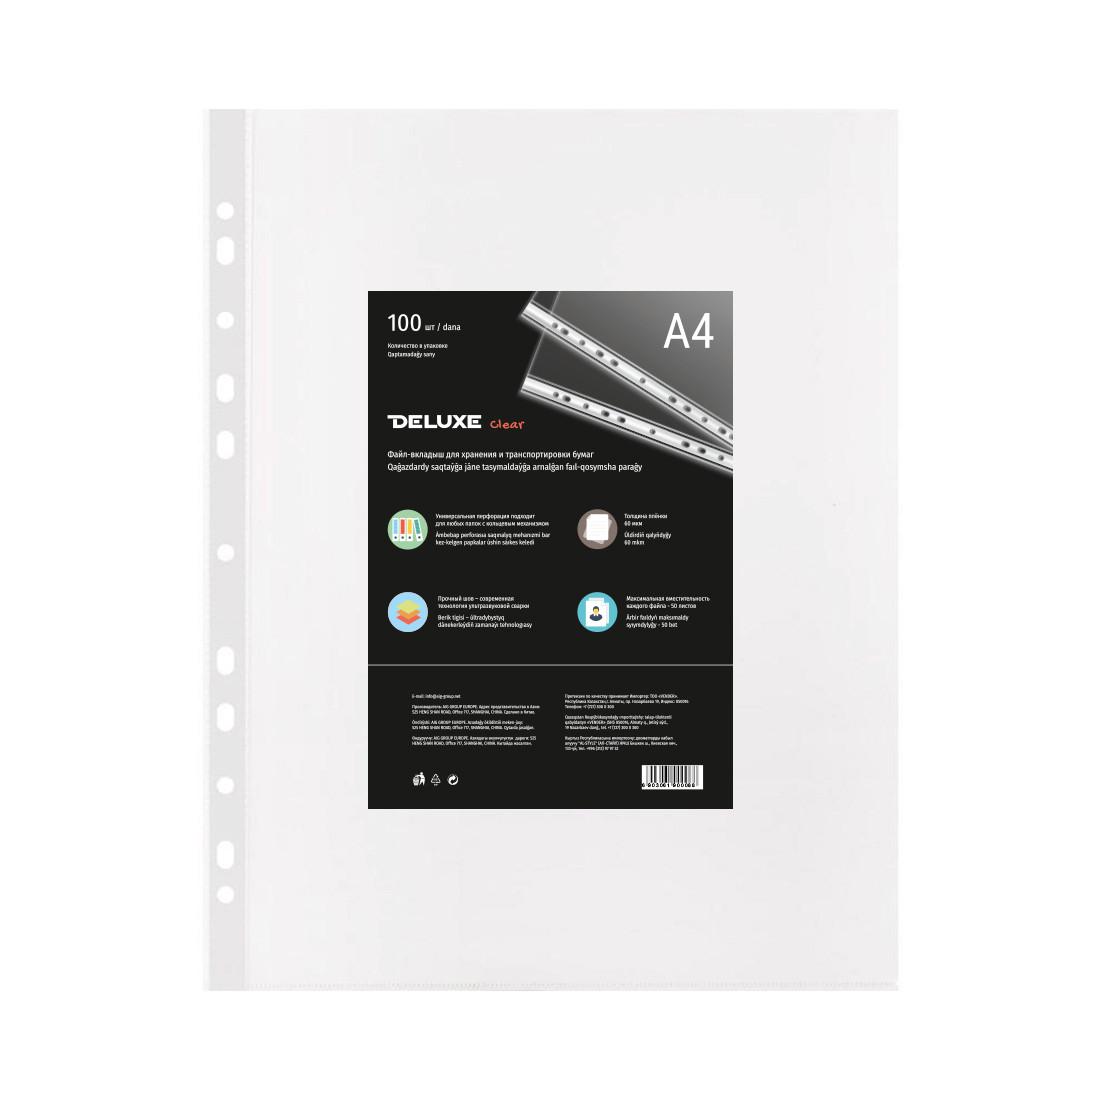 Файл-вкладыш пластиковый Deluxe Clear A460M (A4, Прозрачный, 100 шт)